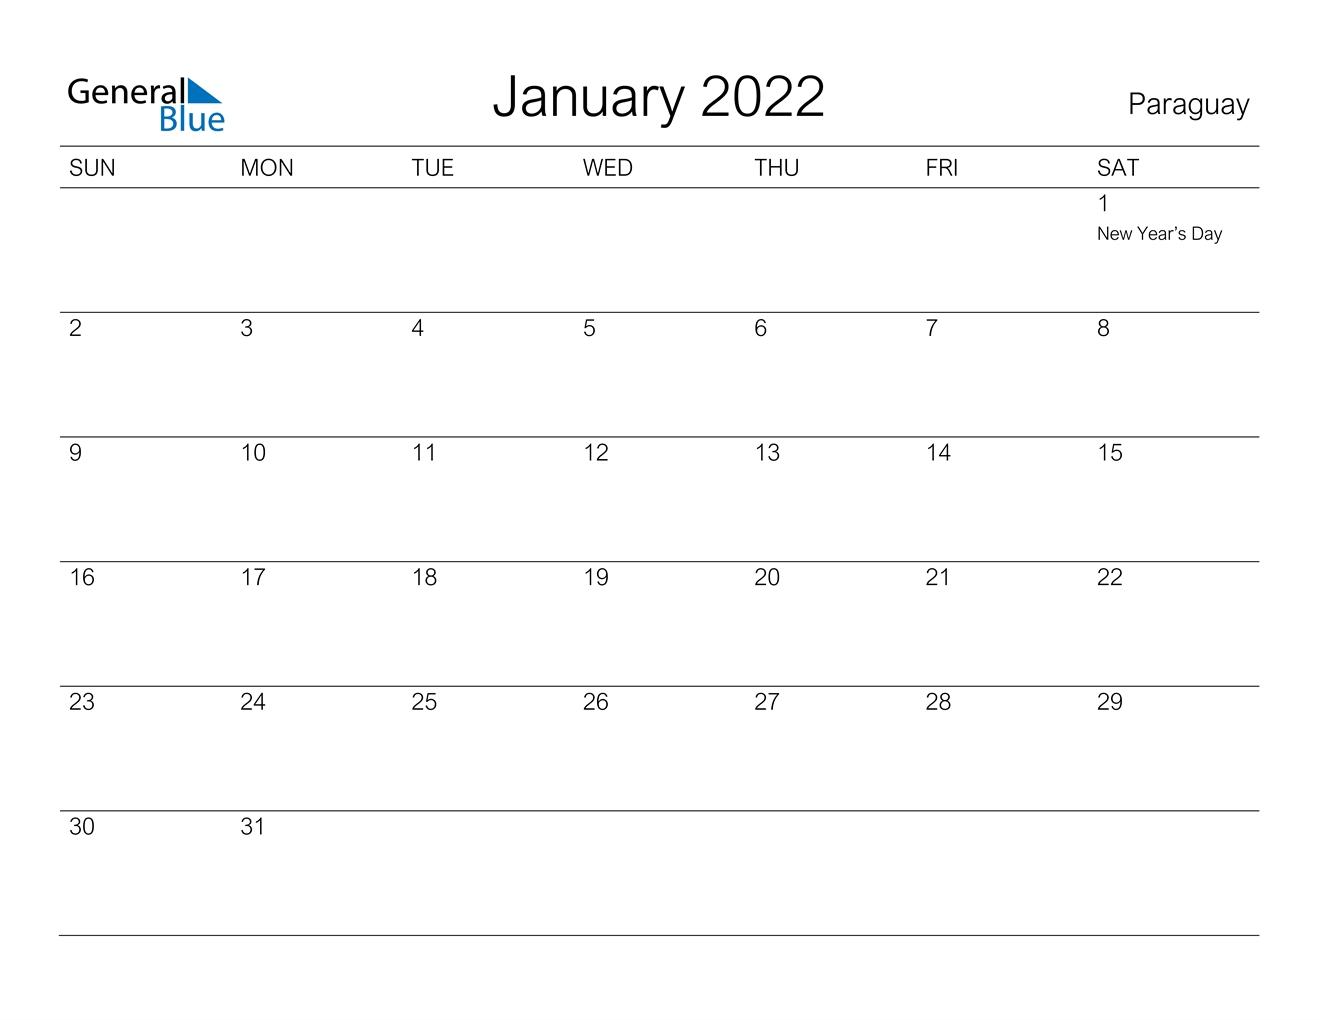 January 2022 Calendar - Paraguay